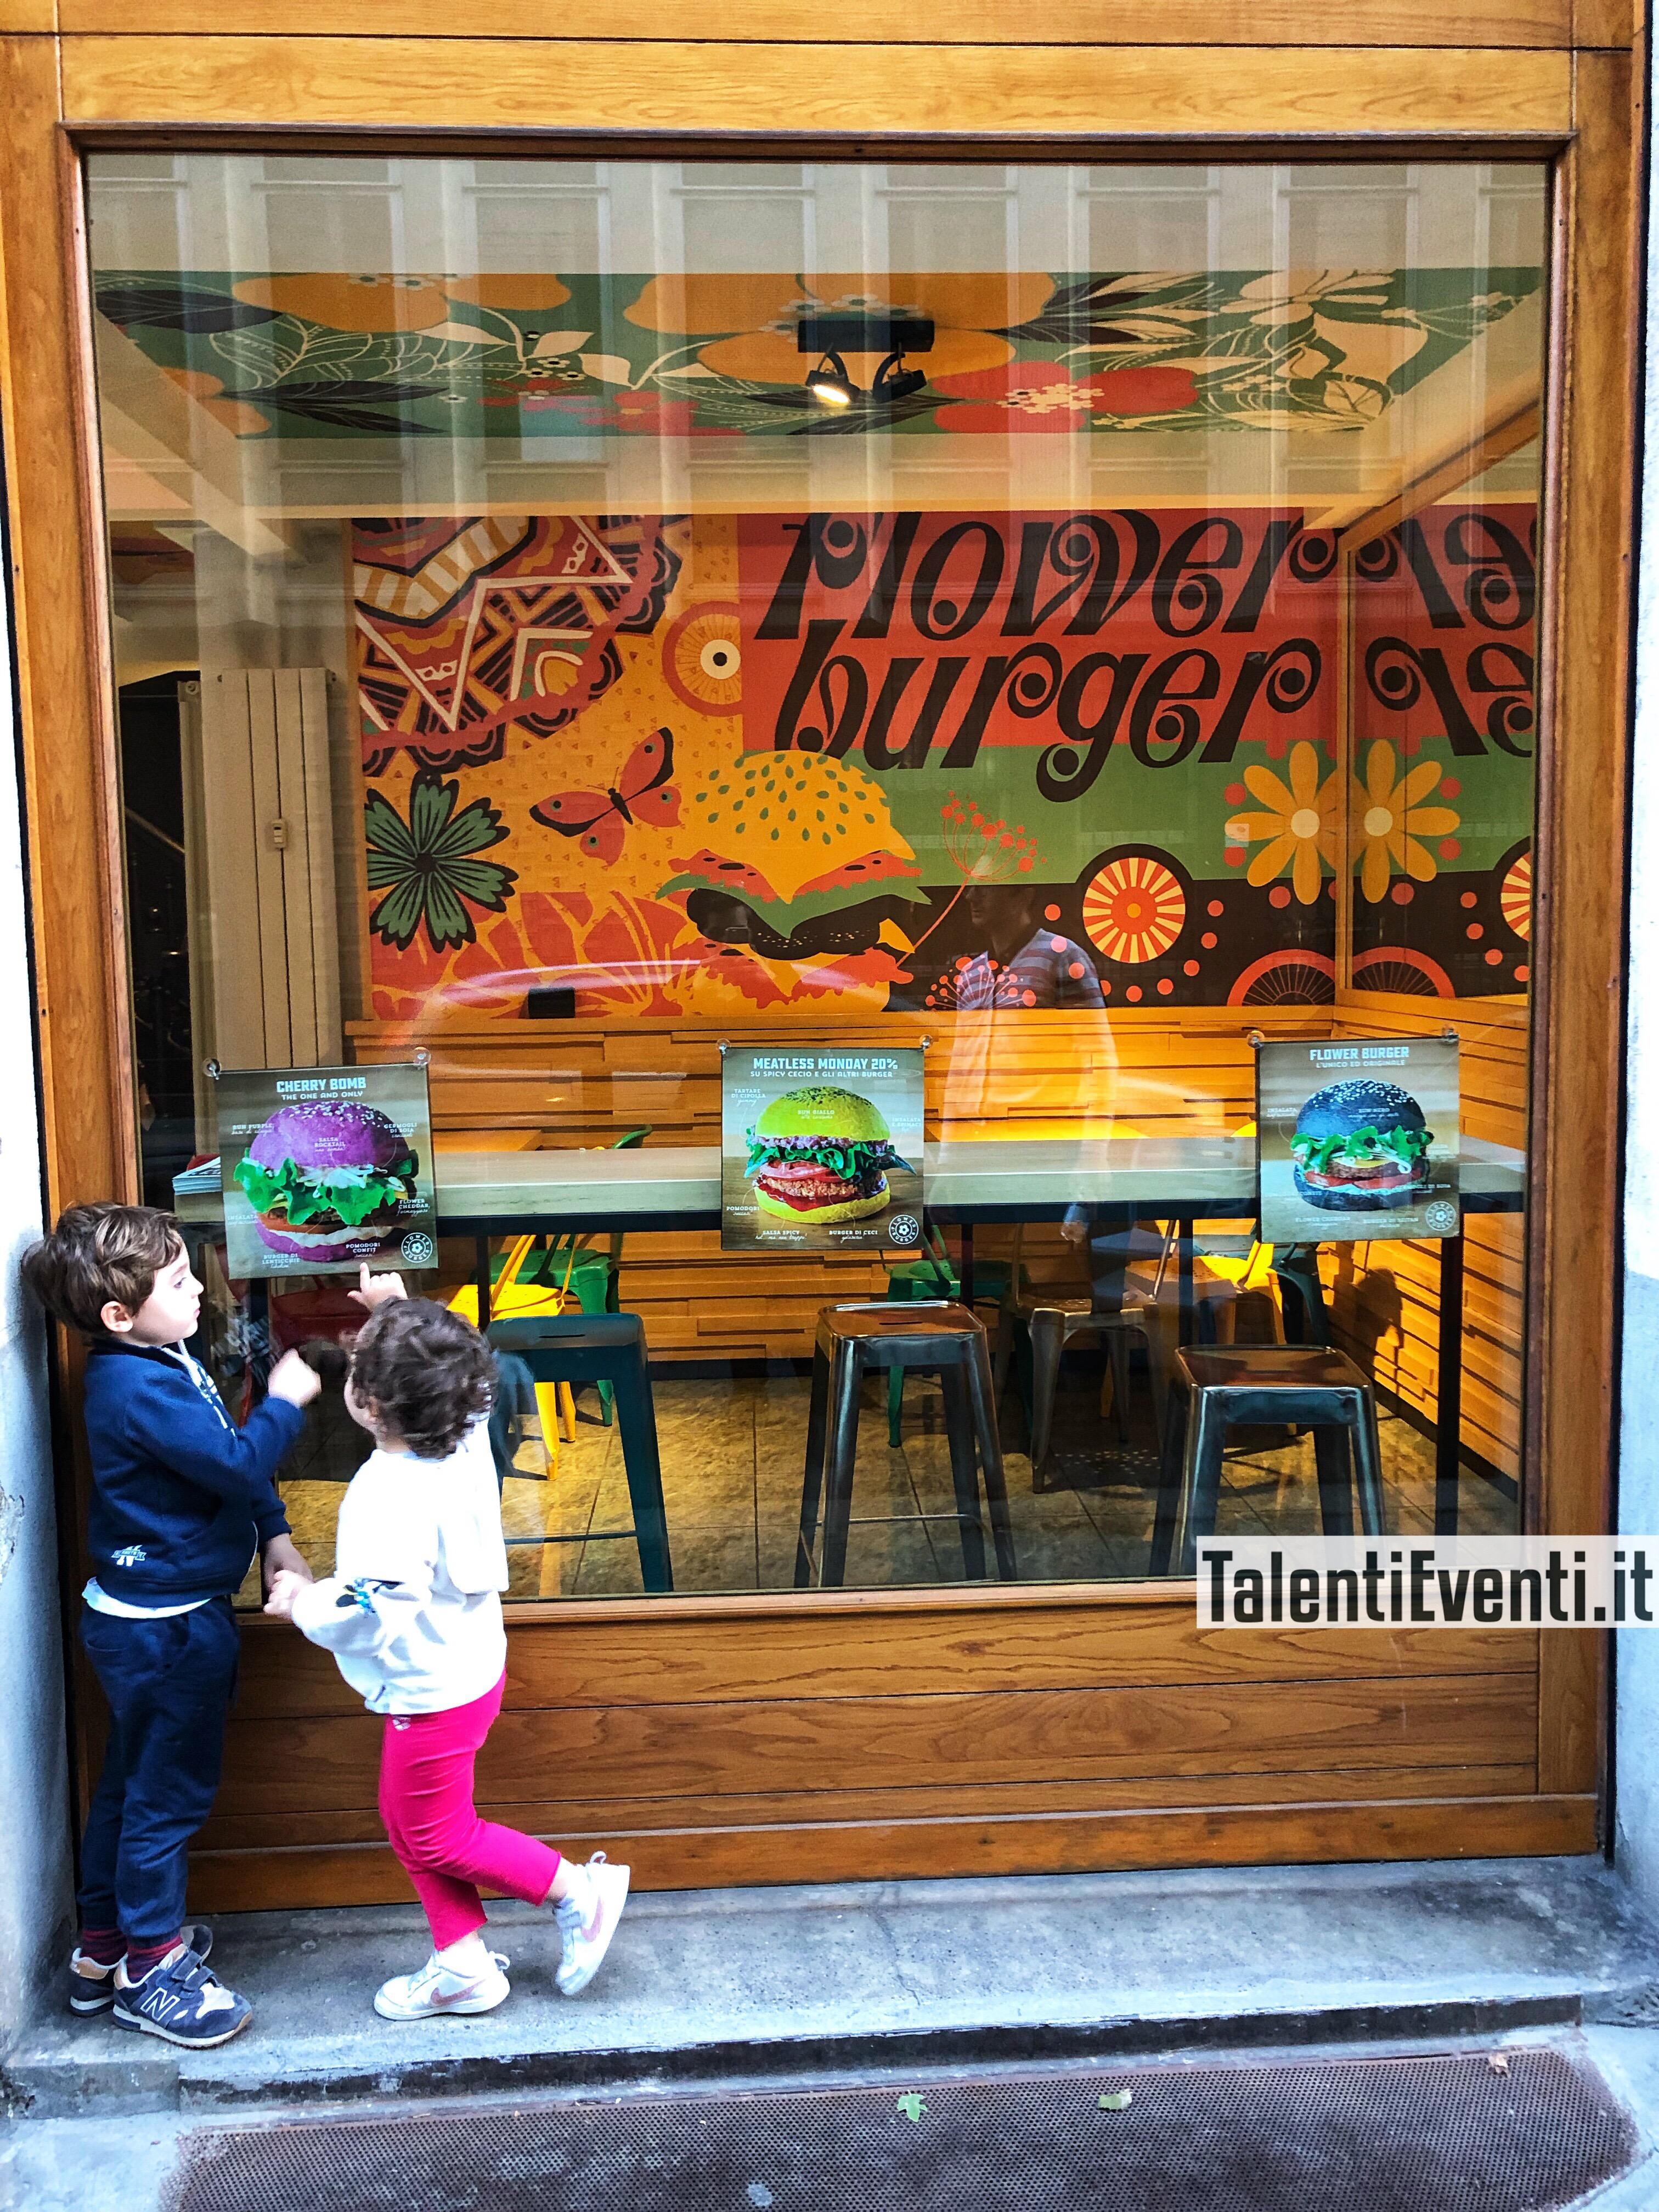 talenti_eventi_torino_flower_burger_2